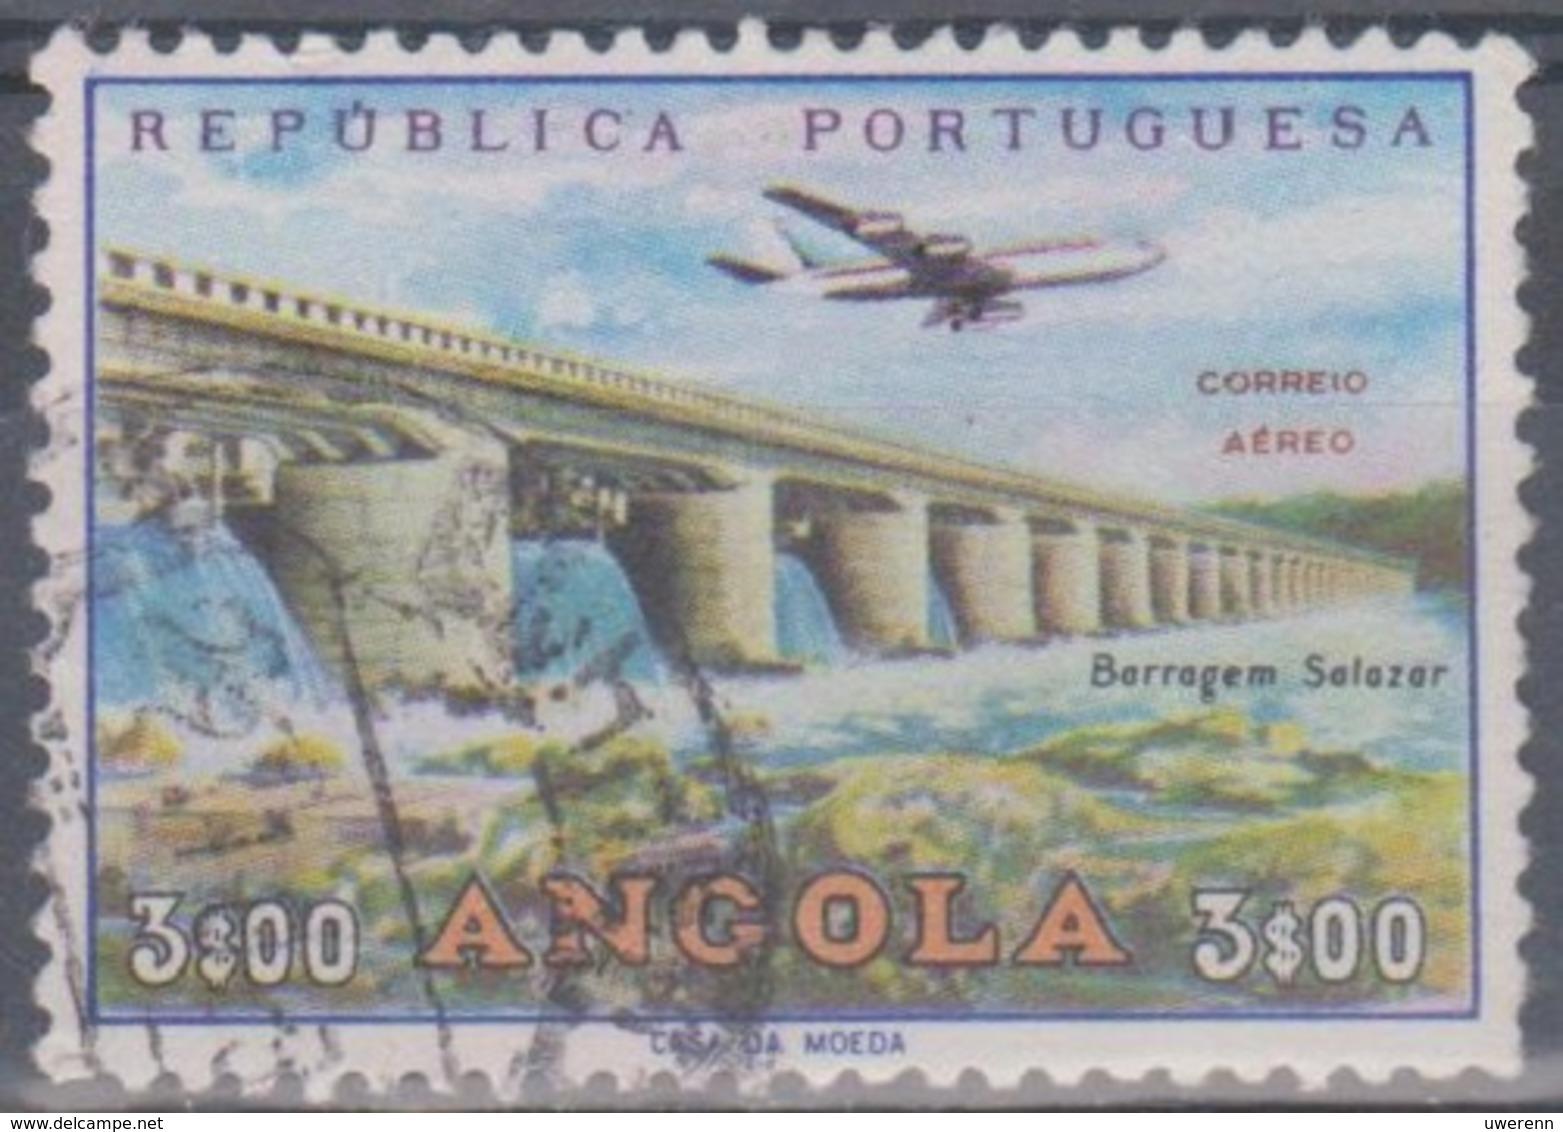 Angola 1965 Flugpostausgabe: Flugzeug über Bauten. Mi 516 3,00 E. Gestempelt - Angola